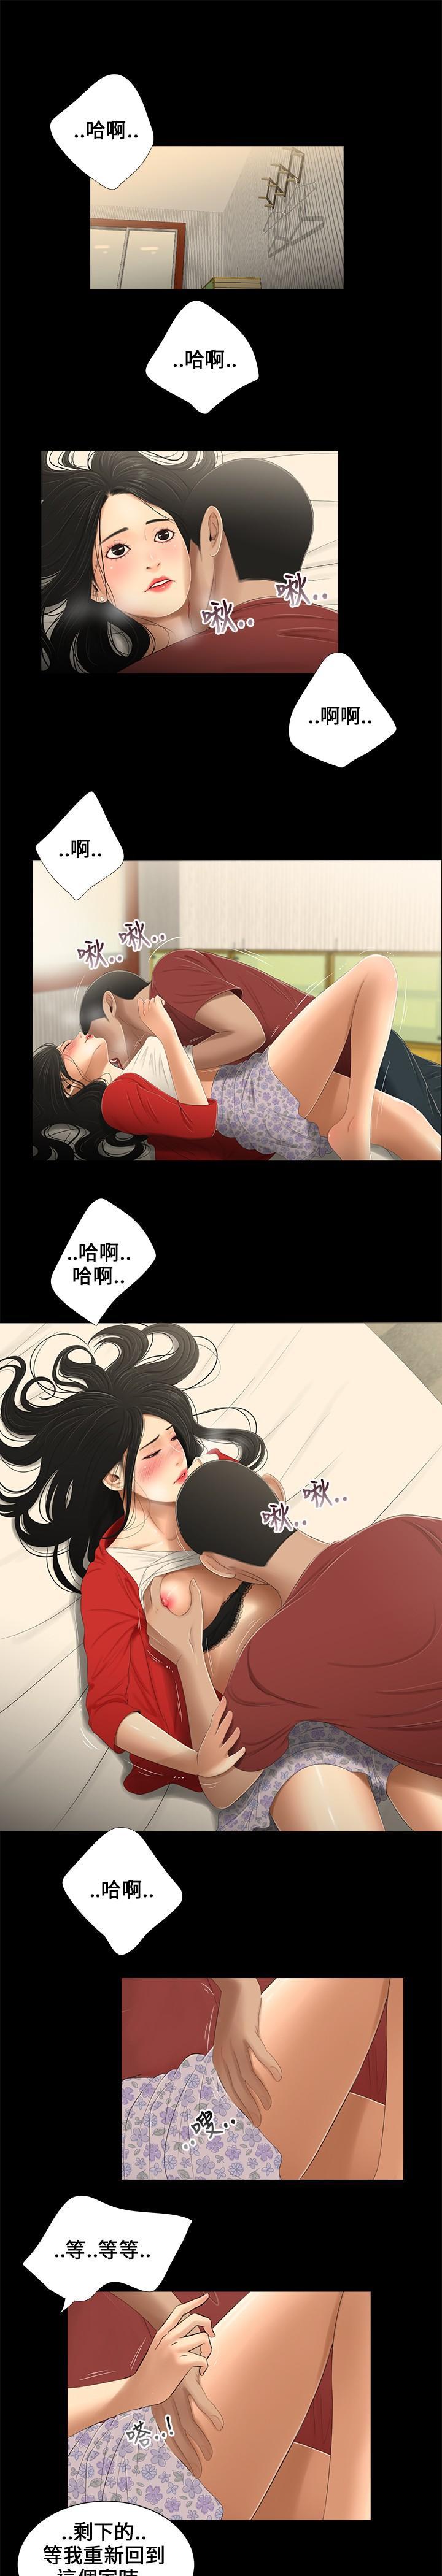 Three sisters 三姐妹Ch.13~19 (Chinese)中文 30